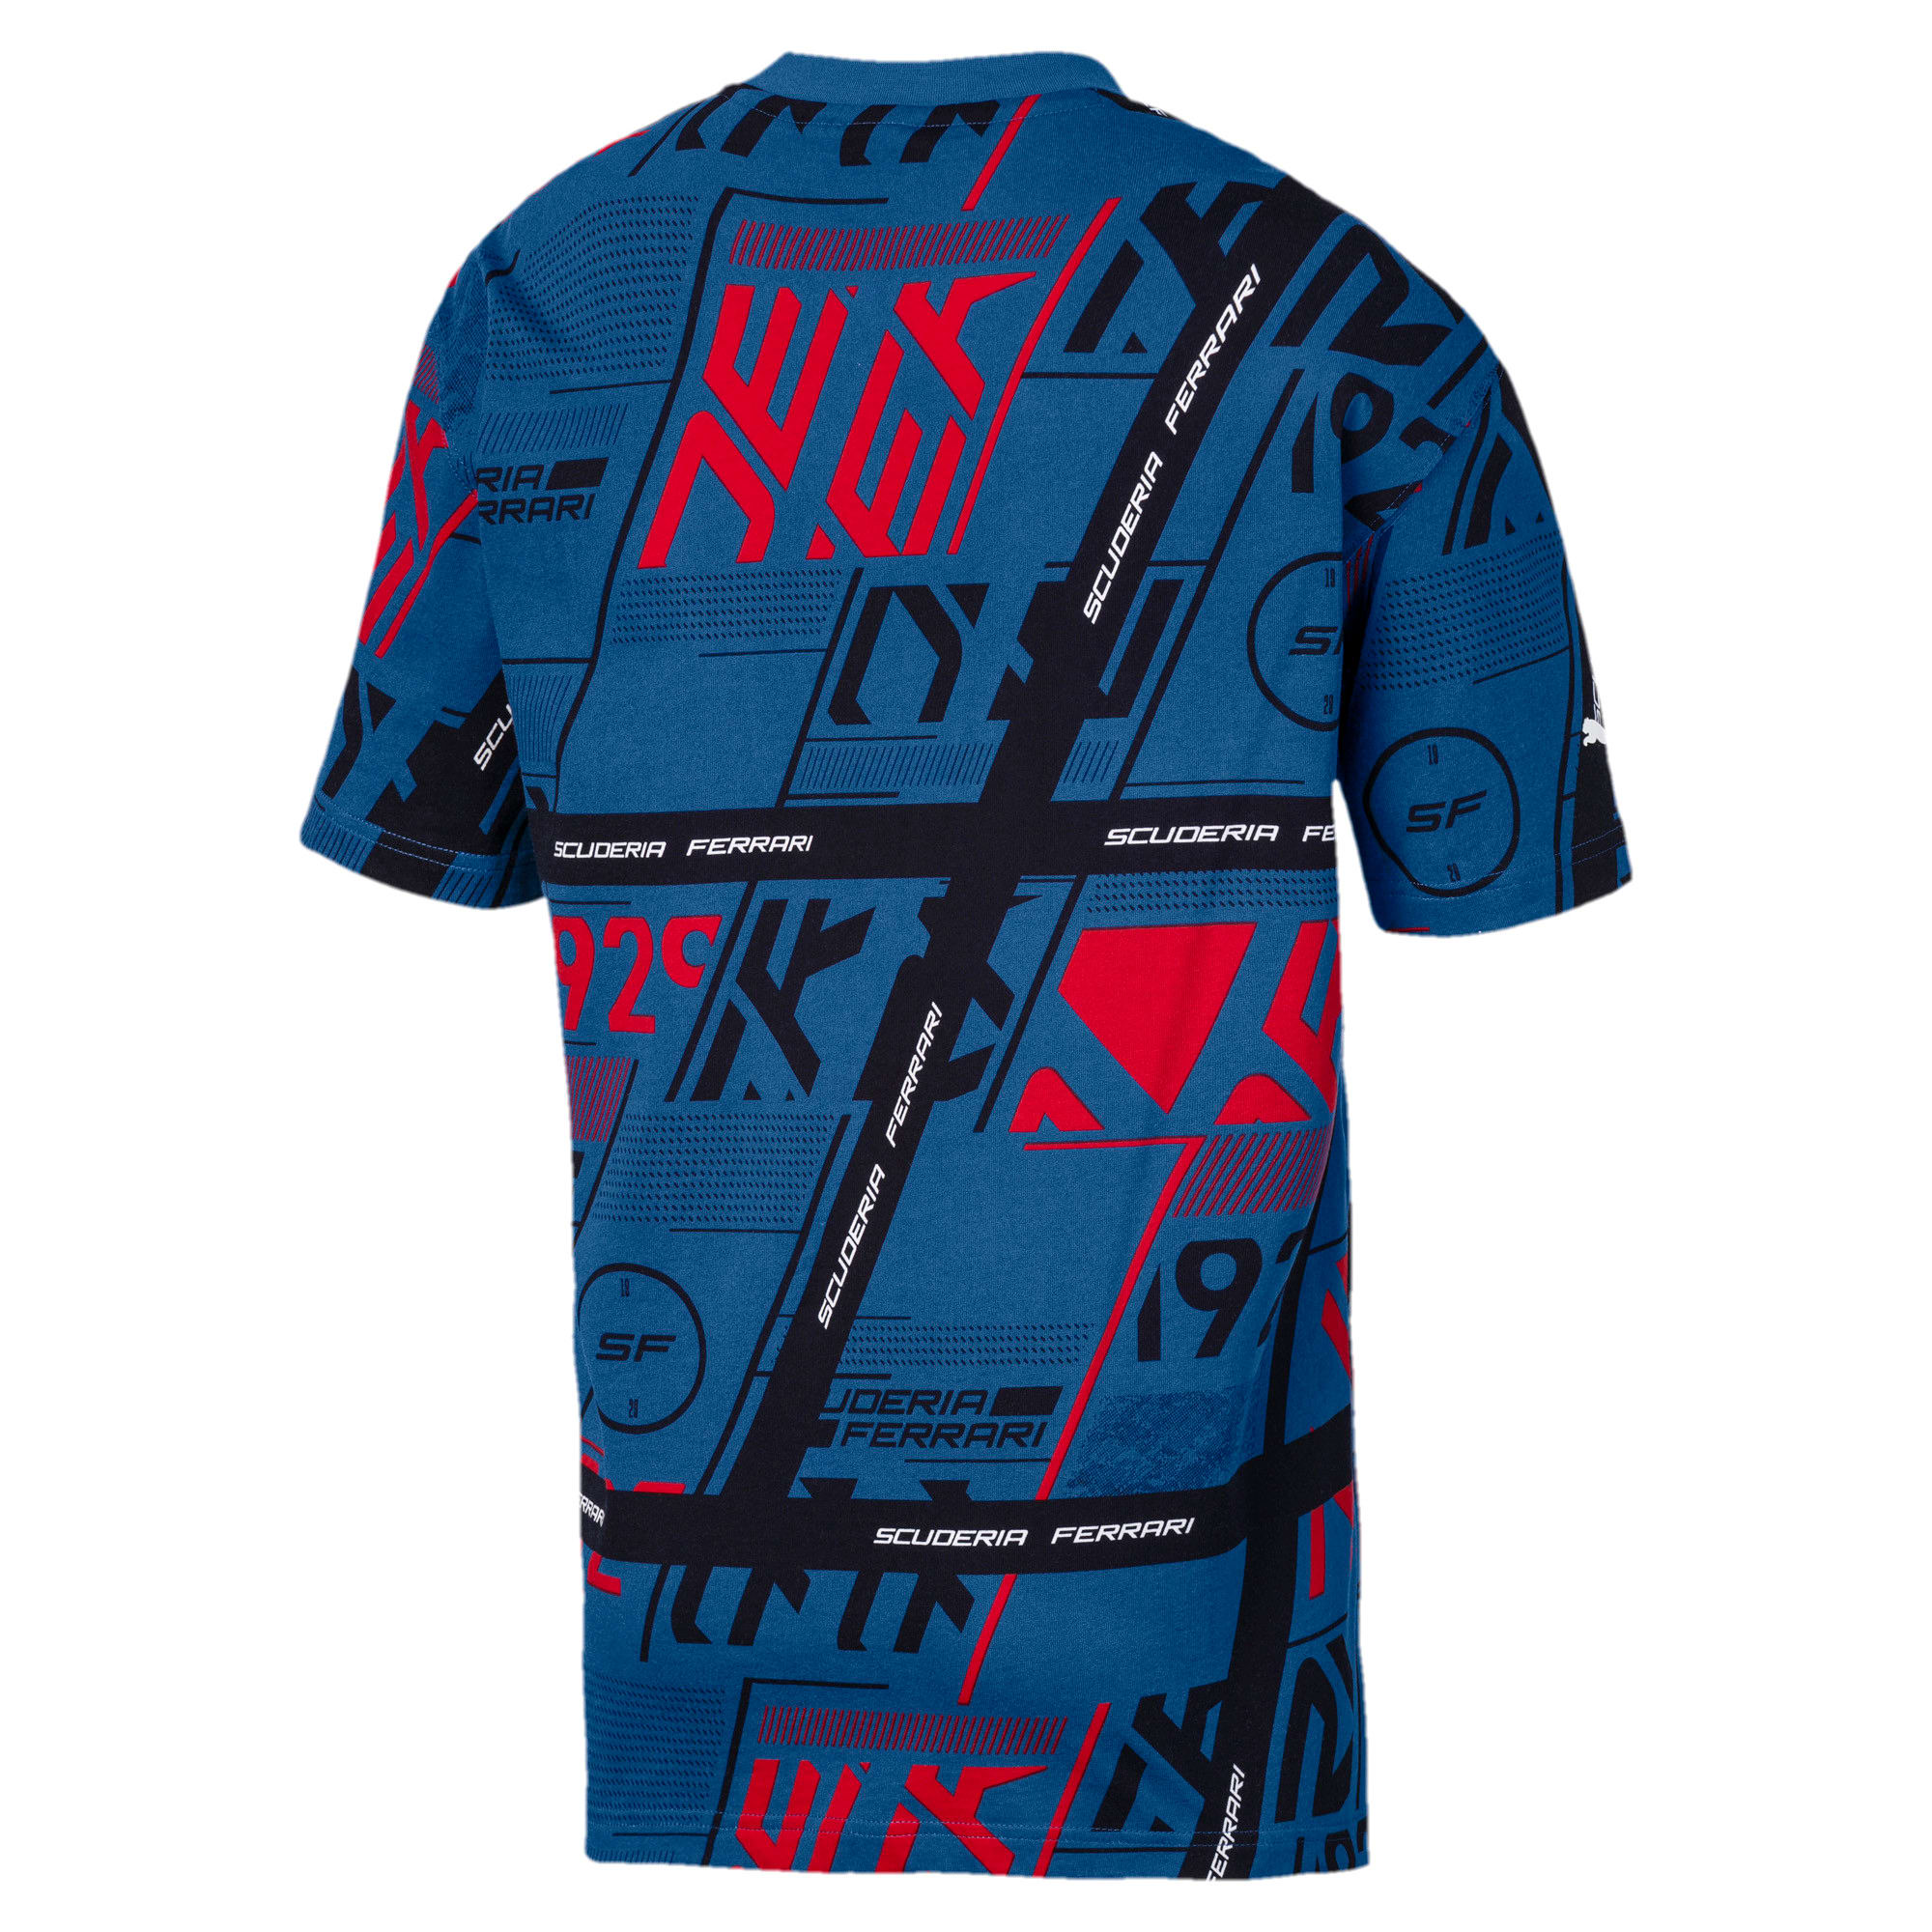 Thumbnail 3 of フェラーリ ストリート Tシャツ 半袖, Galaxy Blue, medium-JPN